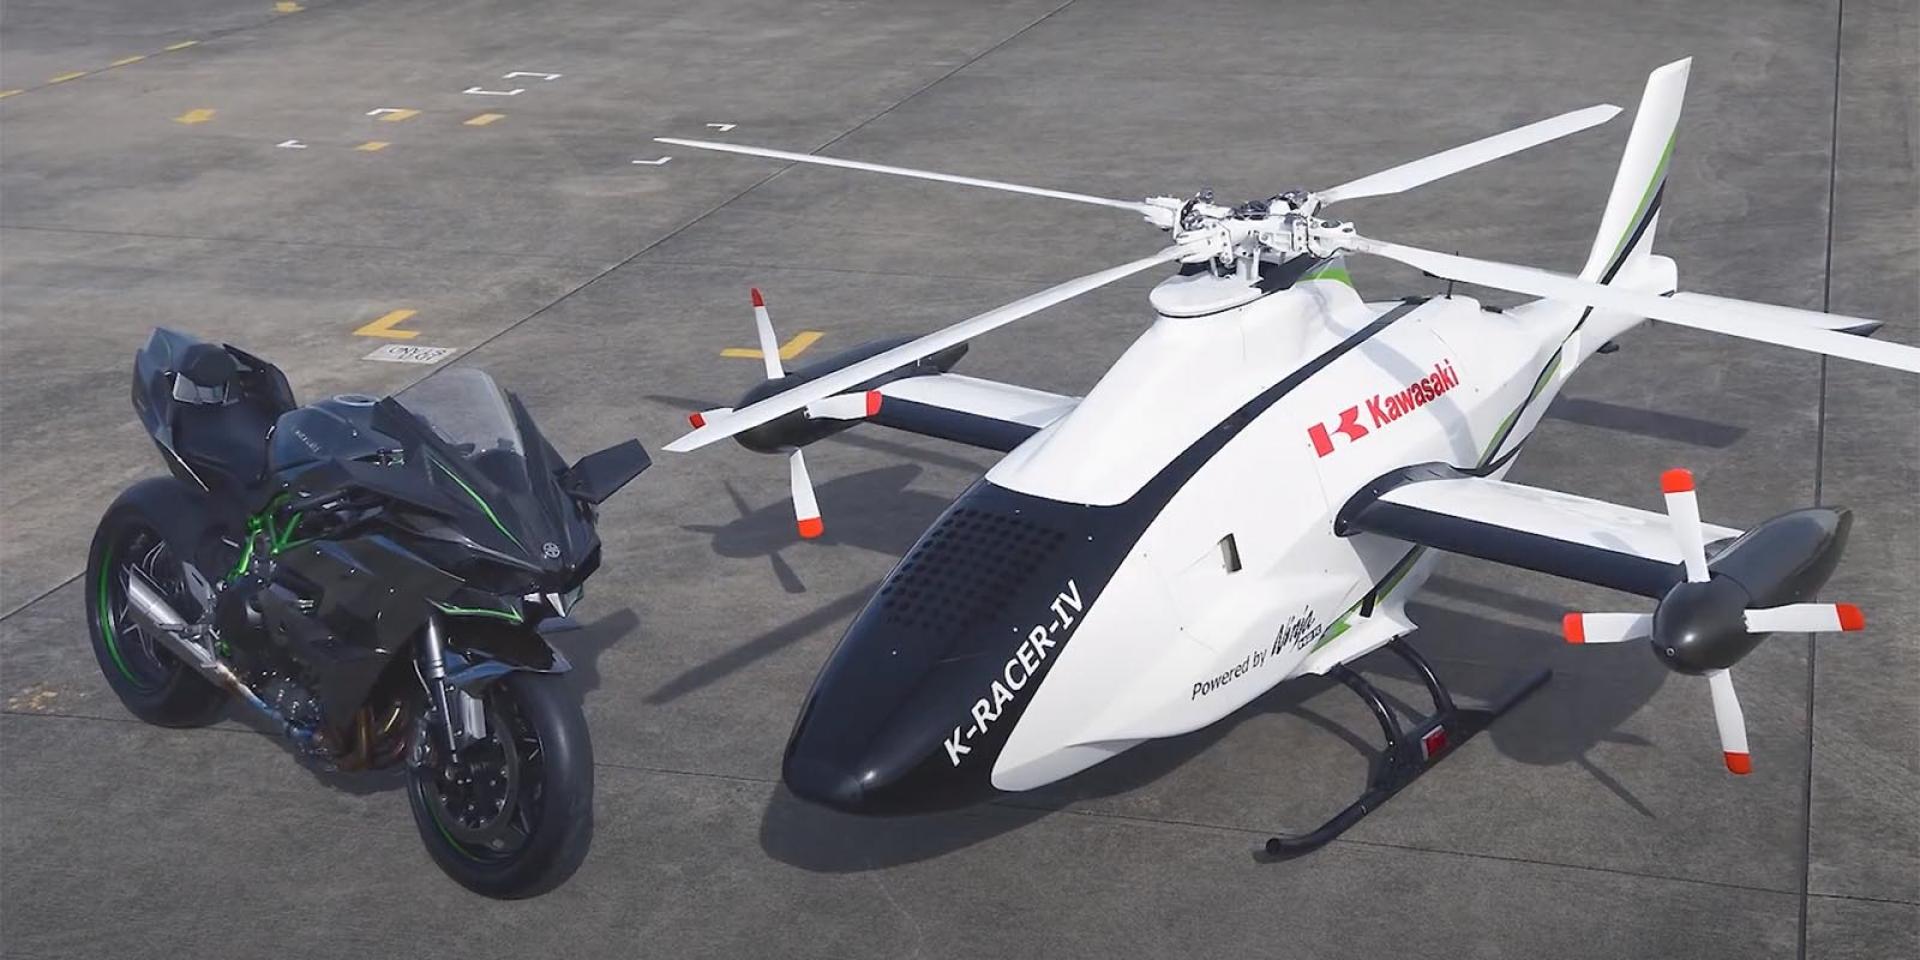 Ninja H2R成功變成直升機升空!KAWASAKI K-RACER 無人機測試成功